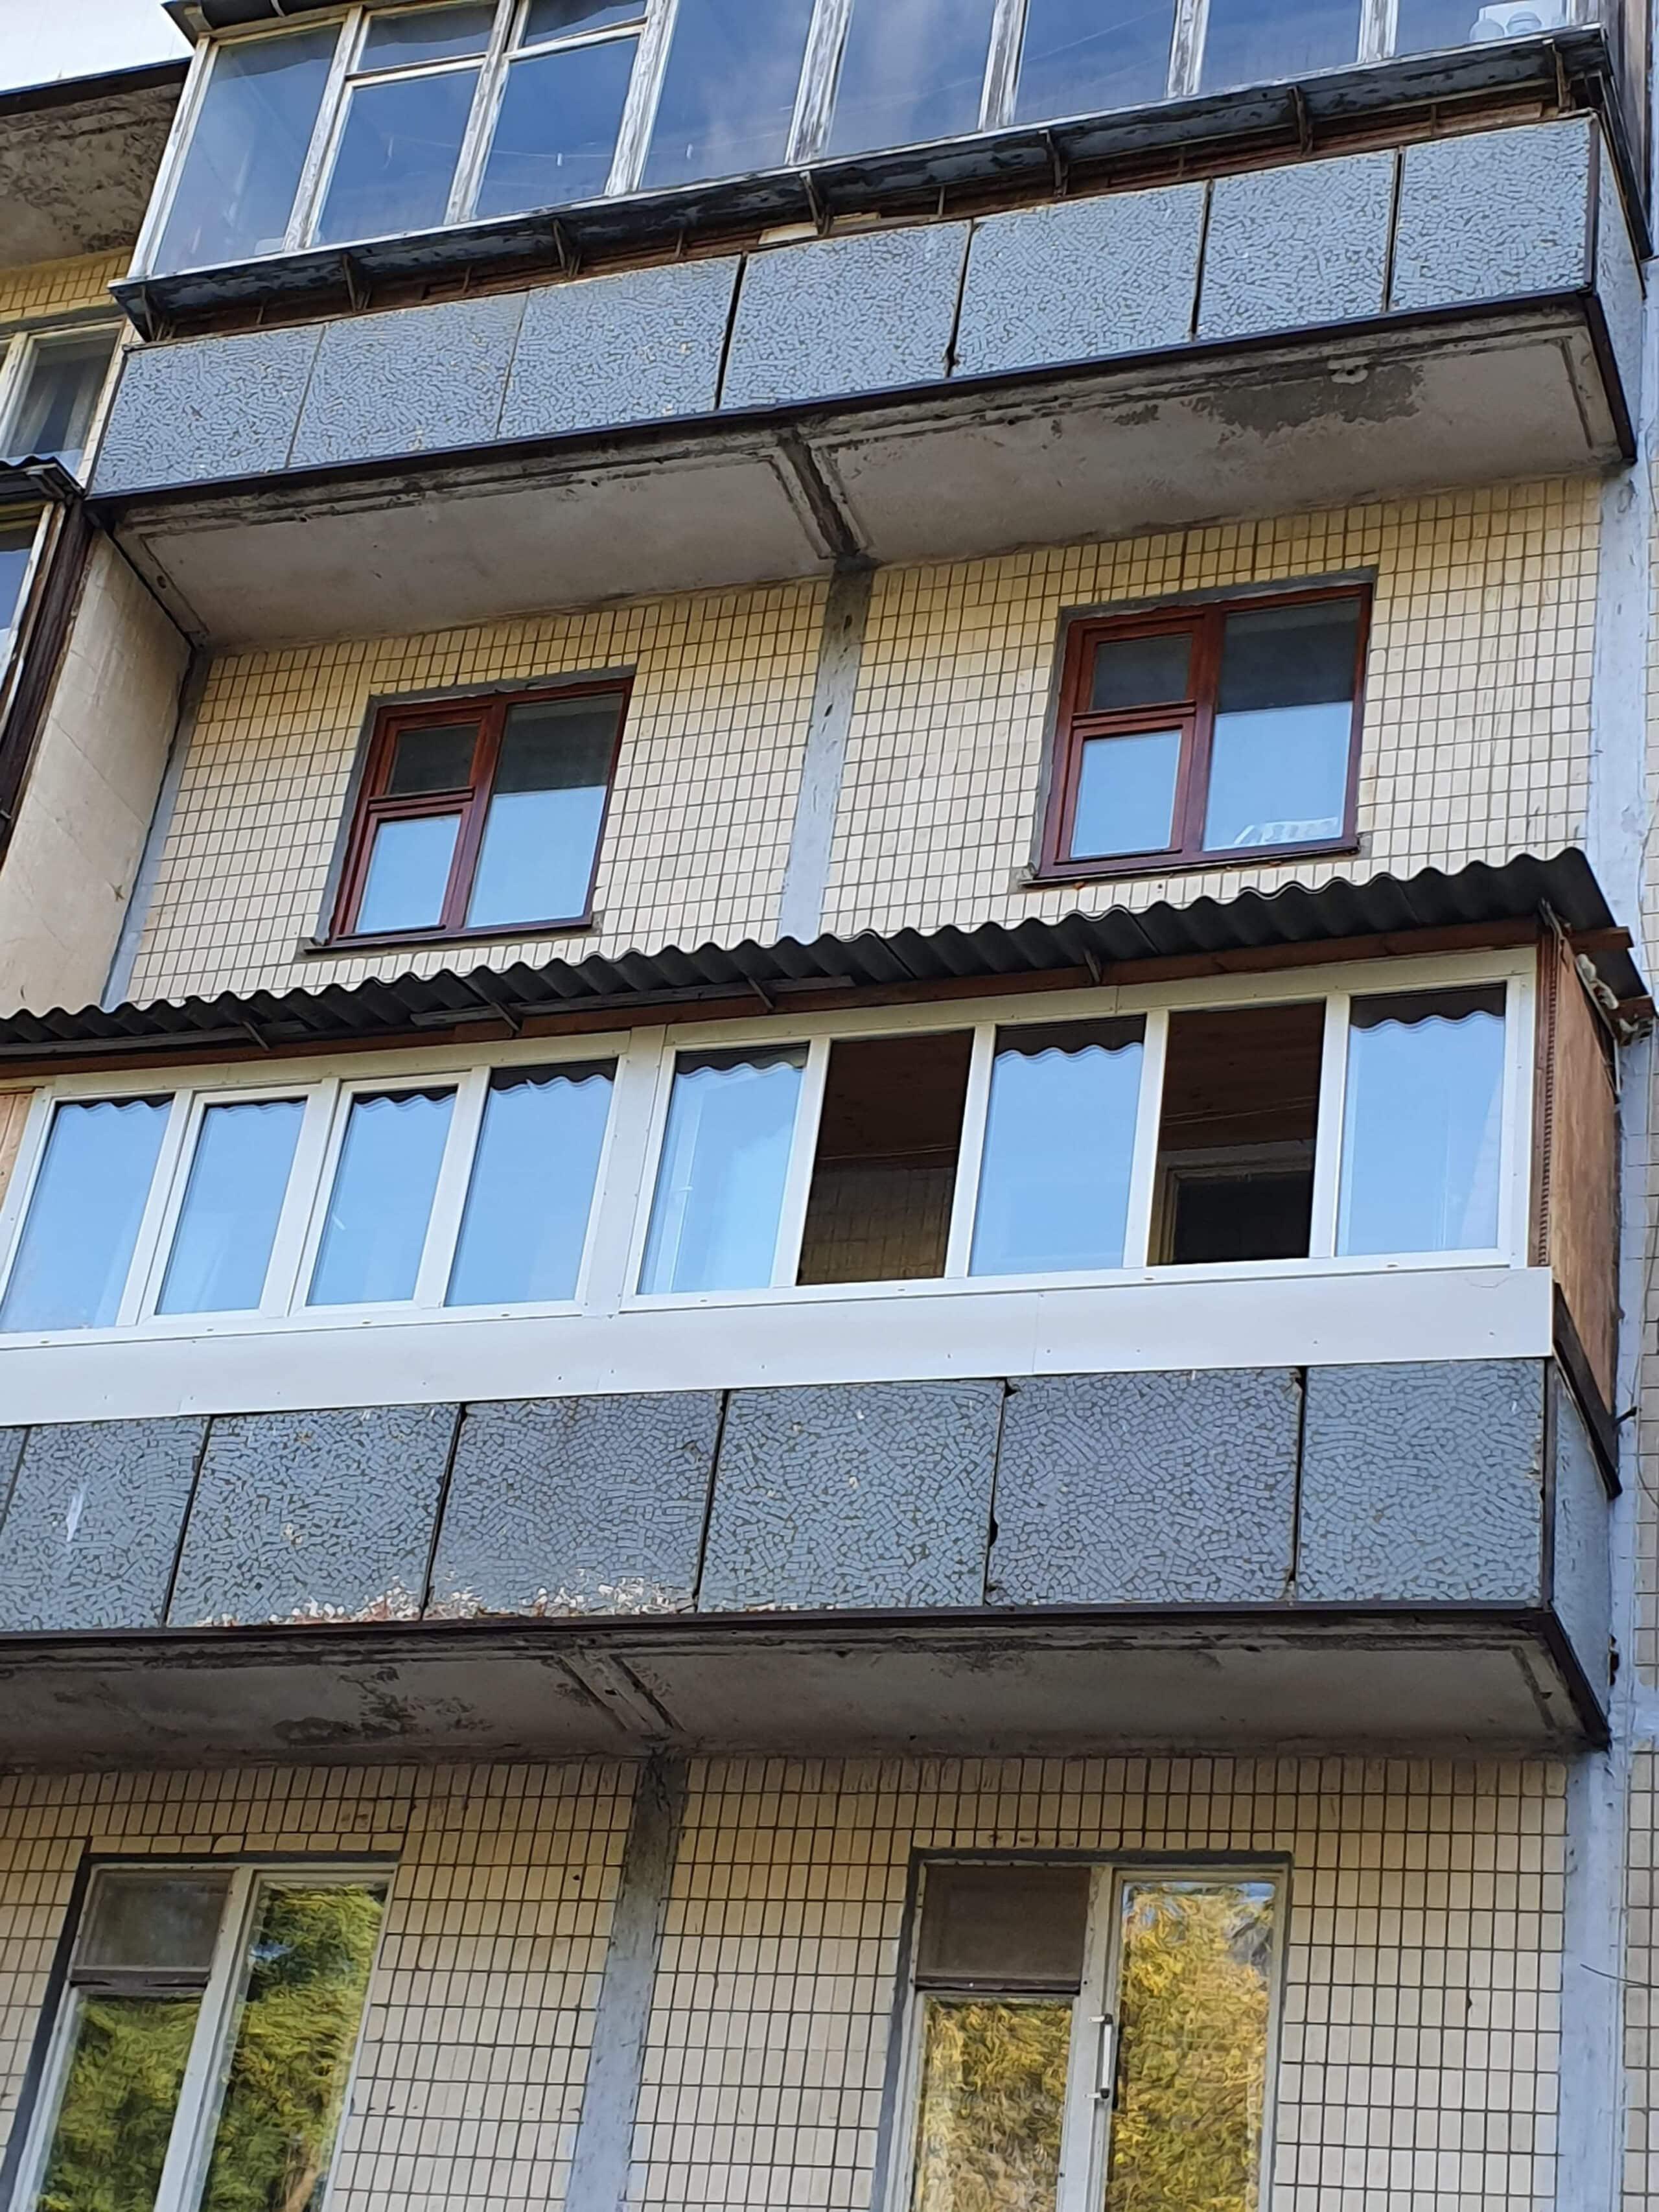 vashfasad-uteplenie-kvartir65